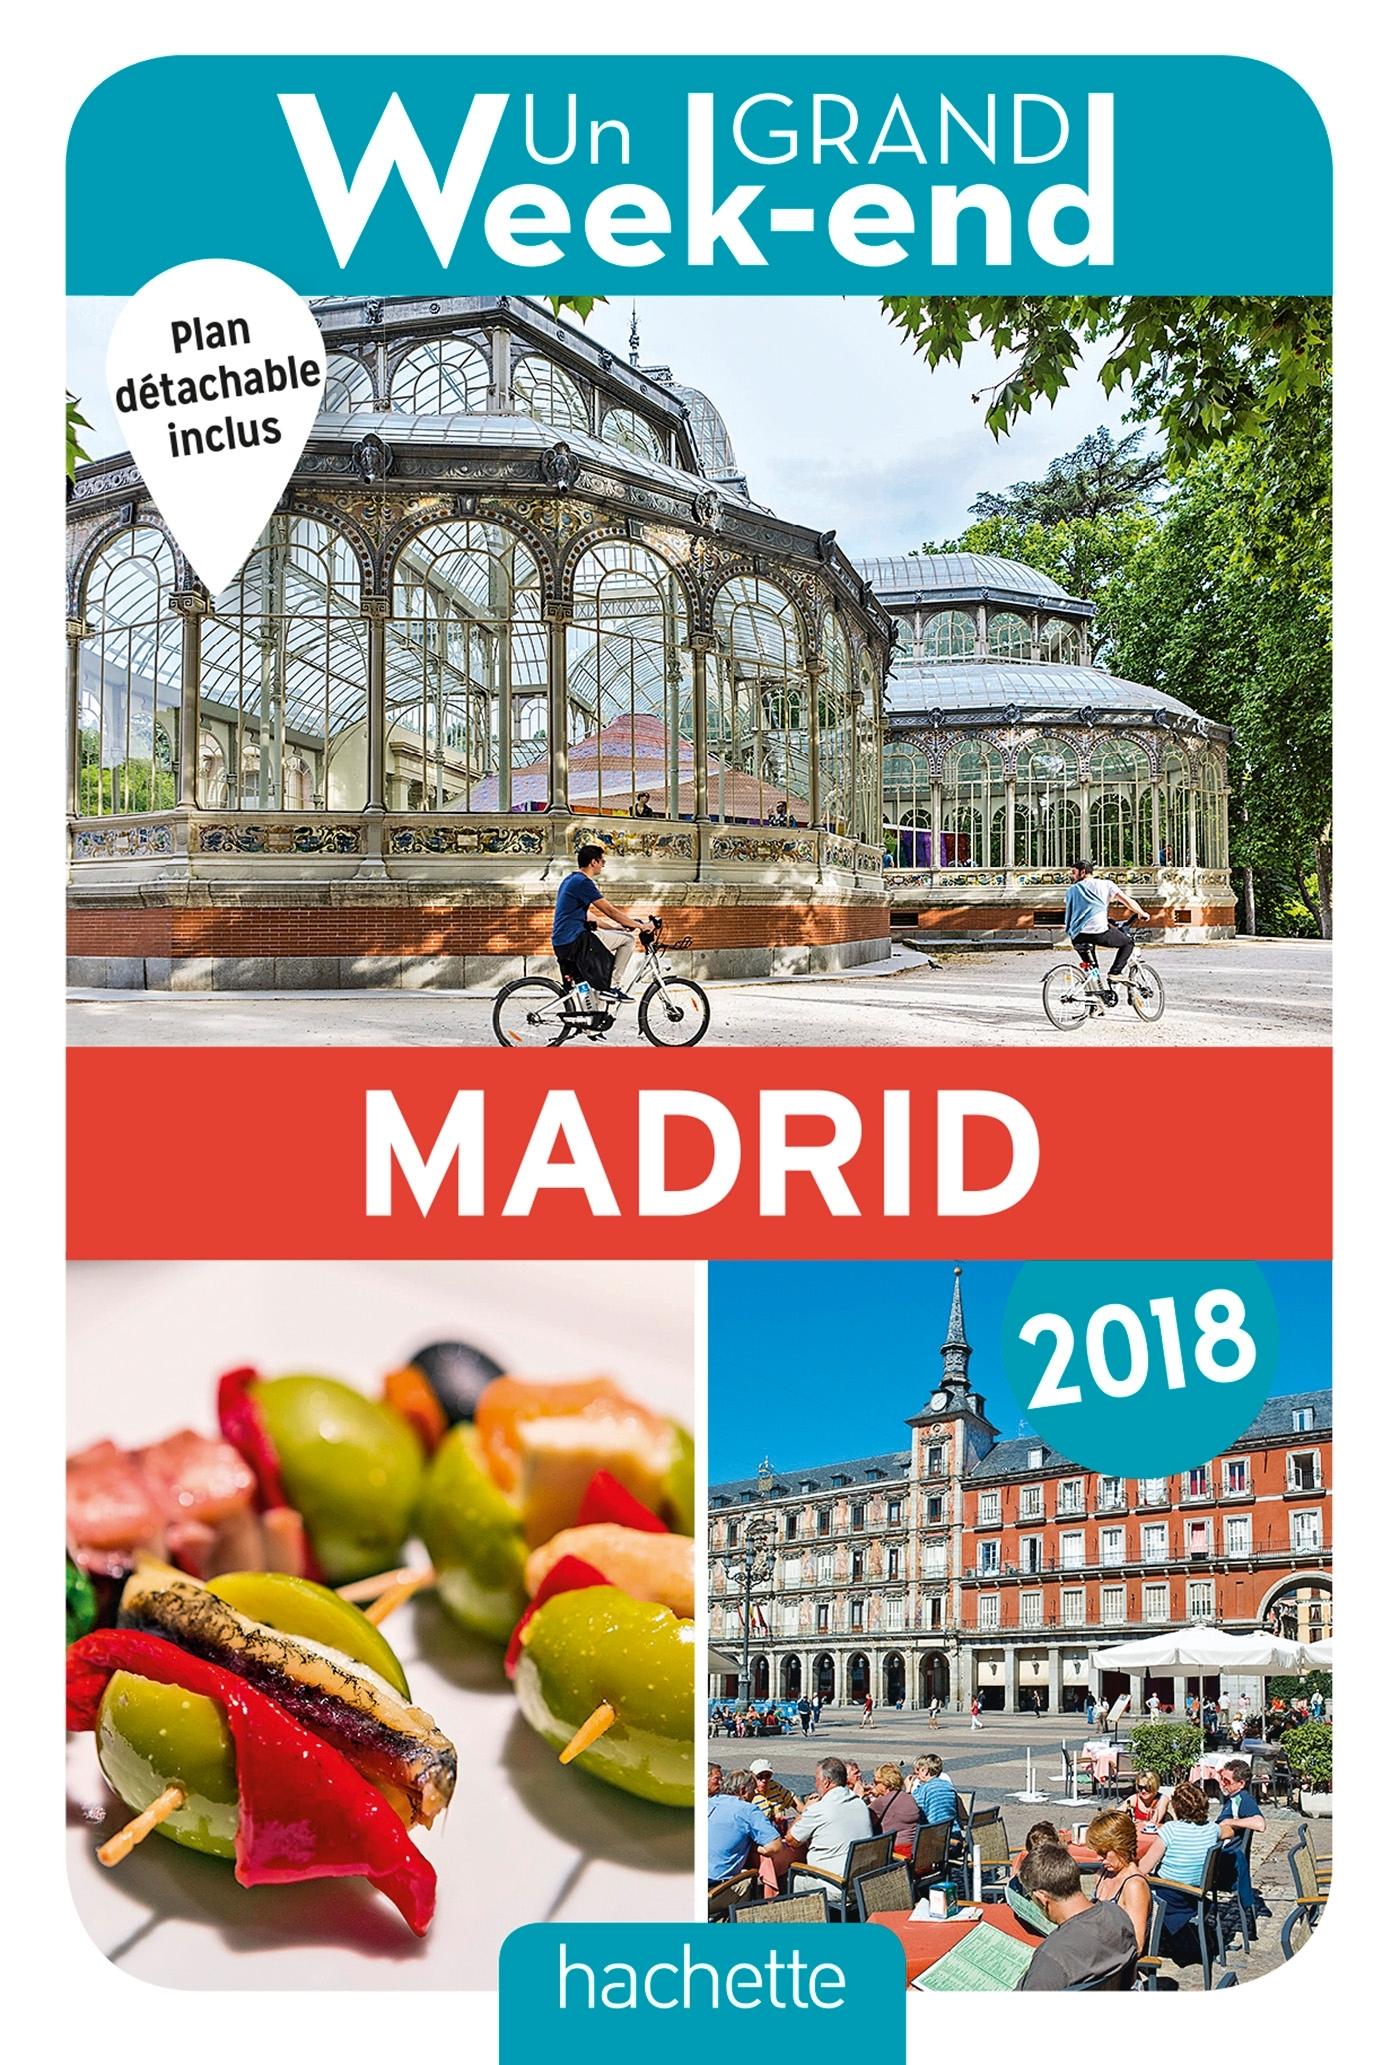 GUIDE UN GRAND WEEK-END A MADRID 2018